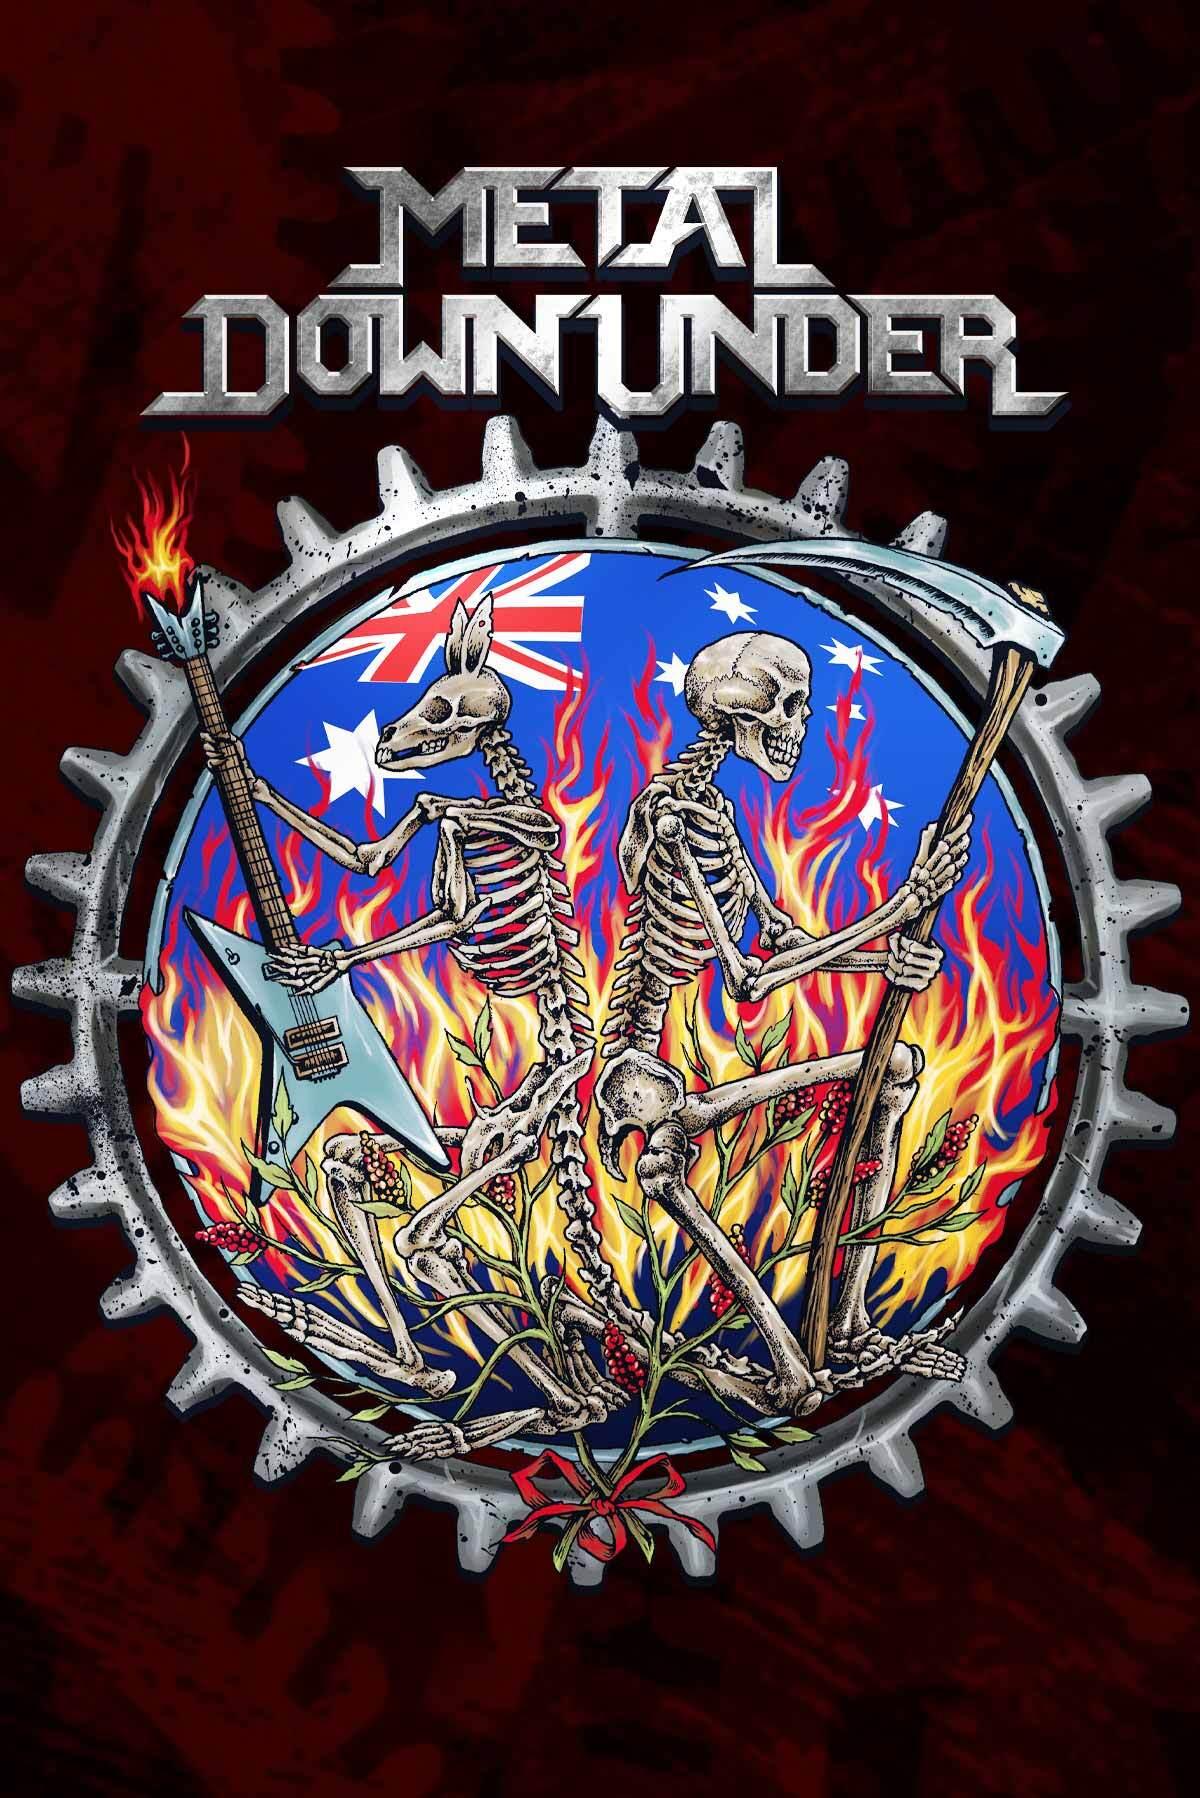 Metal Down Under